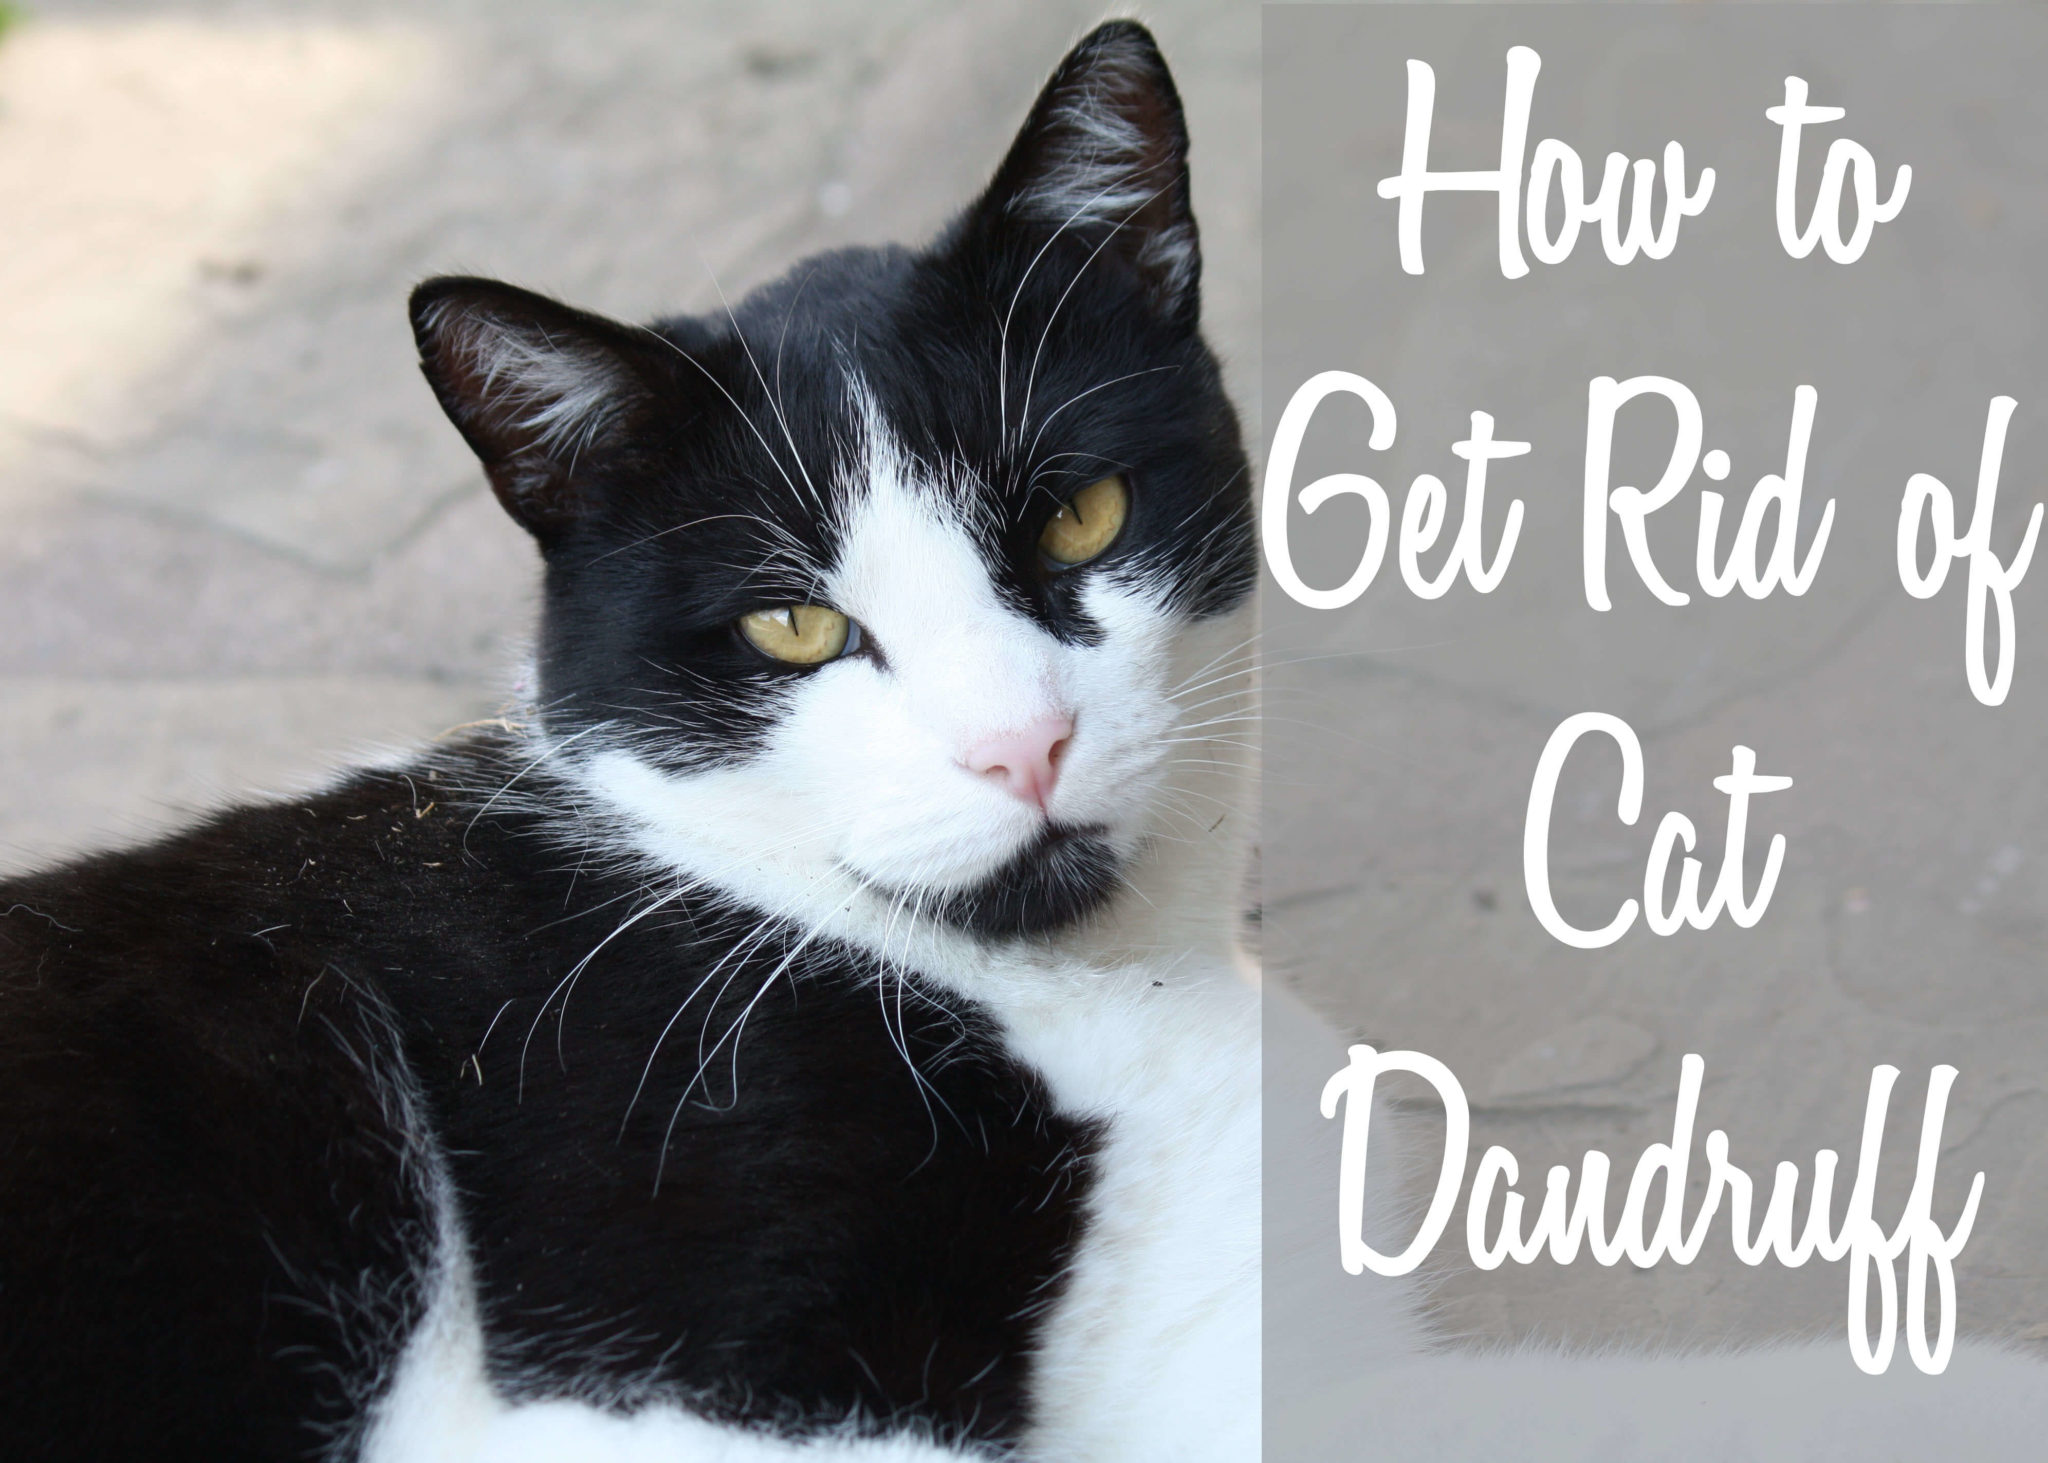 Cat Dandruff: Causes, Symptoms and Treatment 33